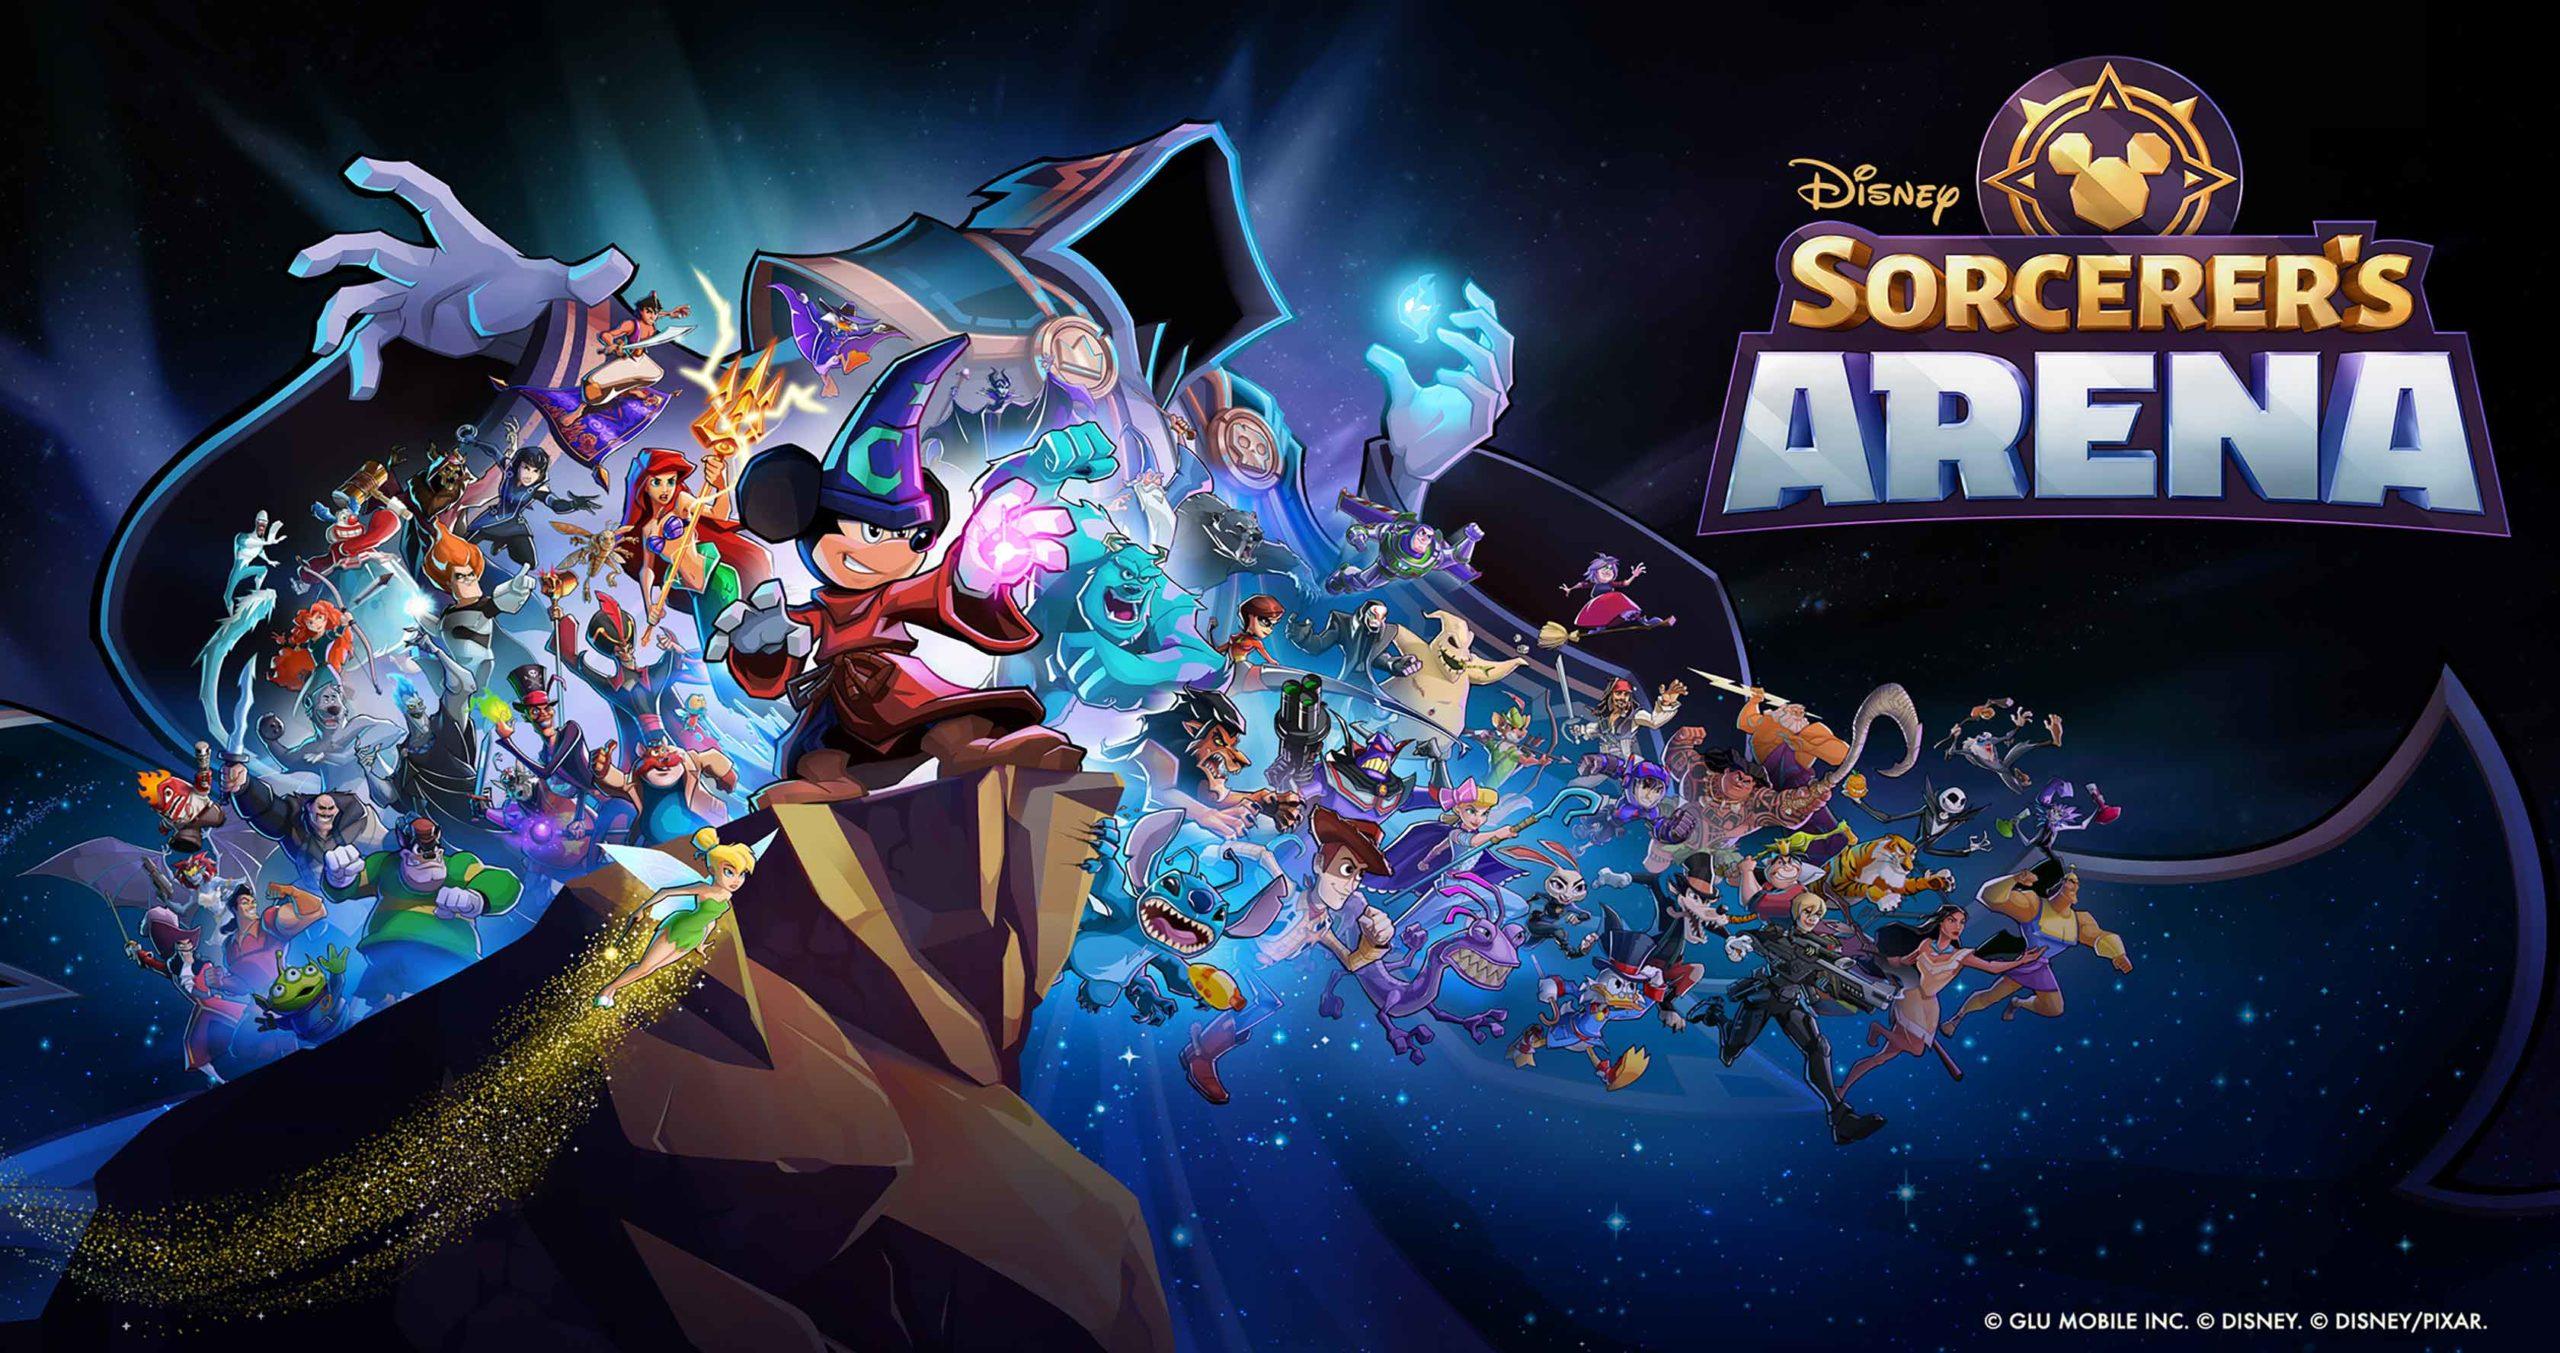 Disney Sorcerer's Arena・Tesztlabor